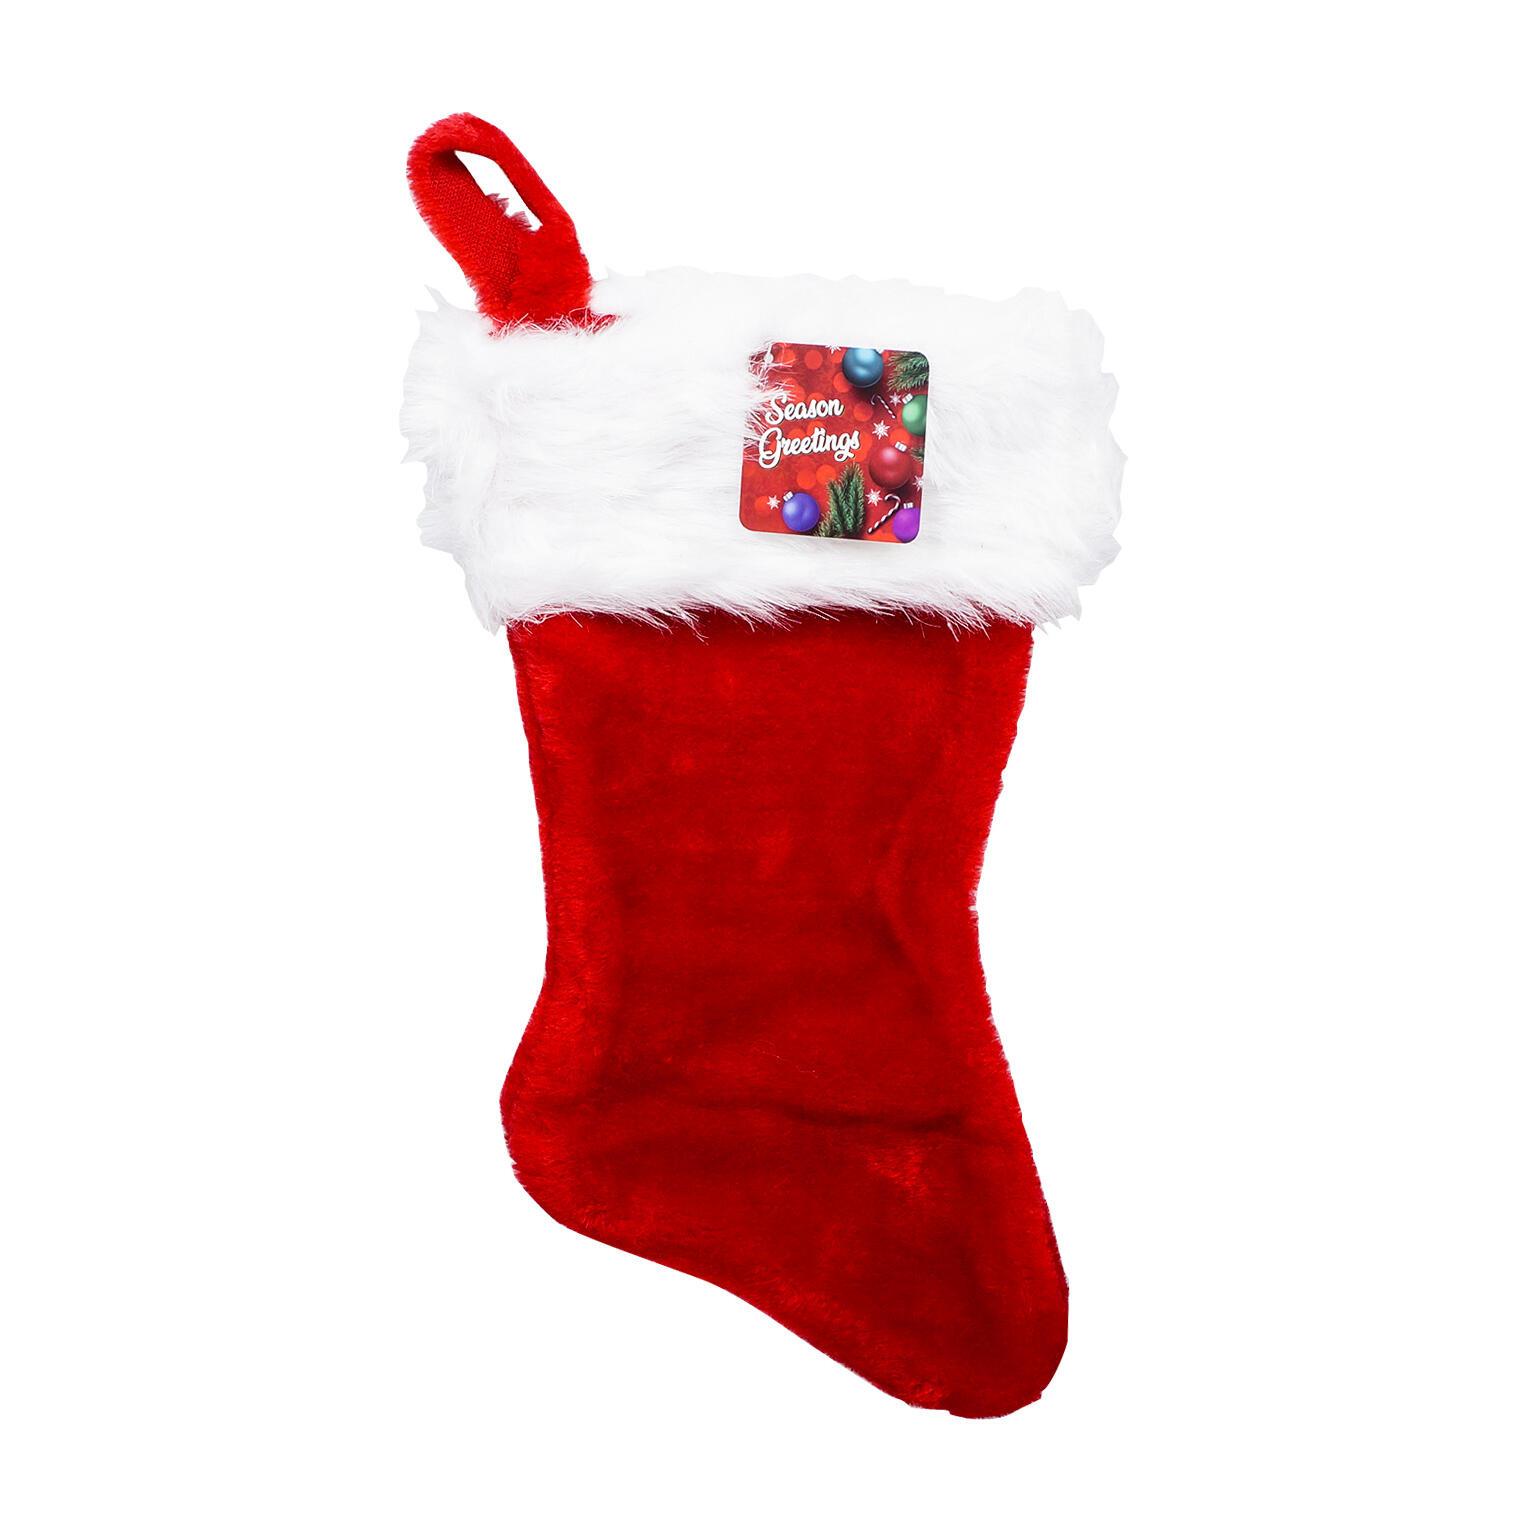 Kidplokio Kids Red Jumbo Holiday Stocking with Plush Faux